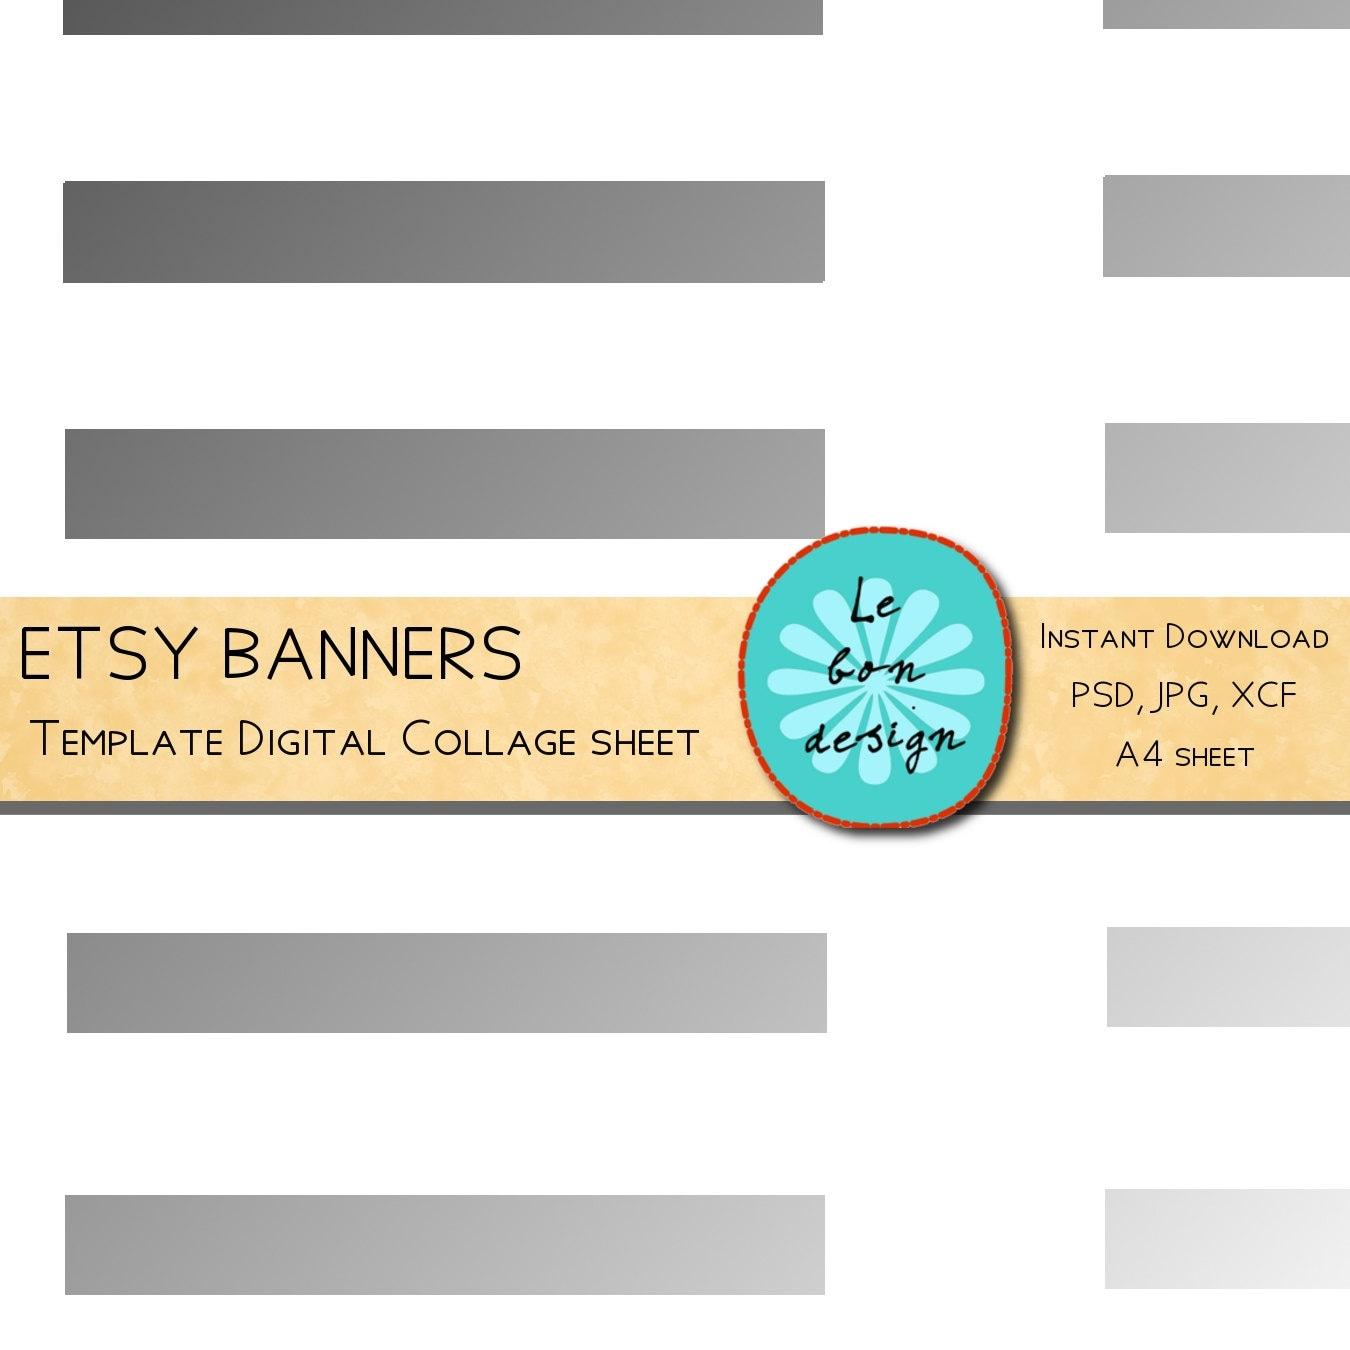 Etsy Banner Template Diy Digital Collage Sheet Jpg Psd Gimp Etsy